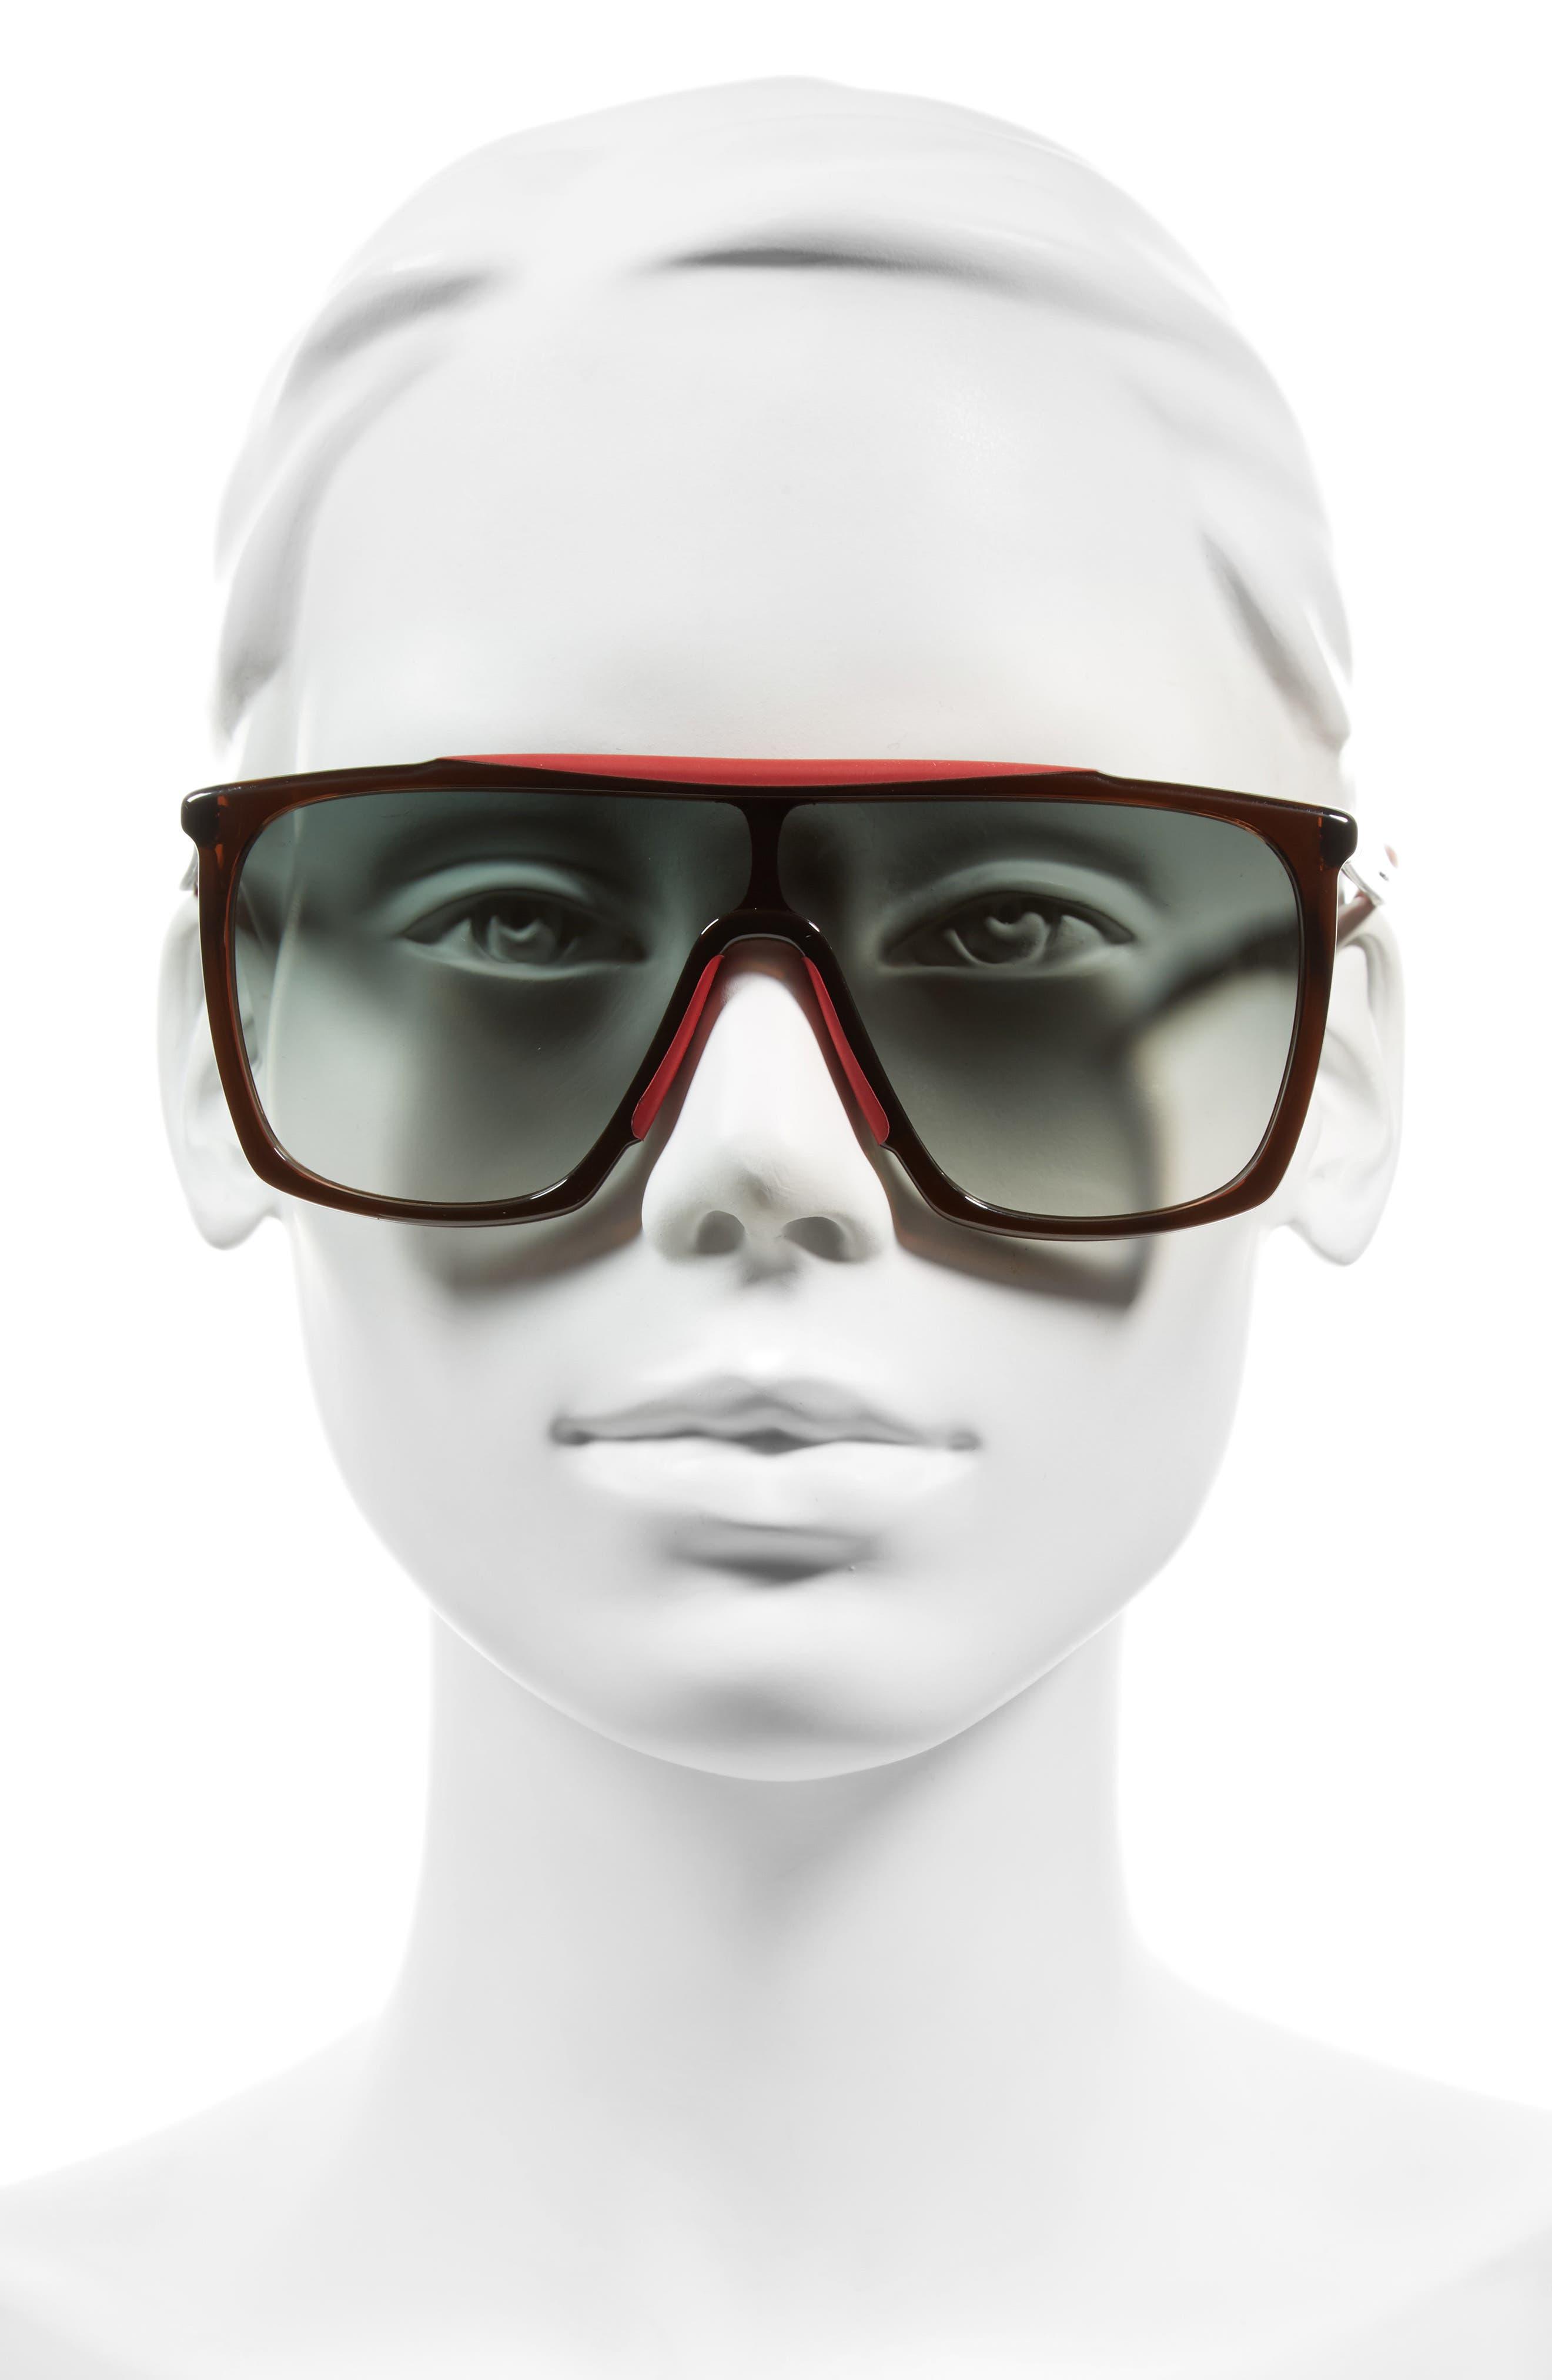 53mm Mask Sunglasses,                             Alternate thumbnail 6, color,